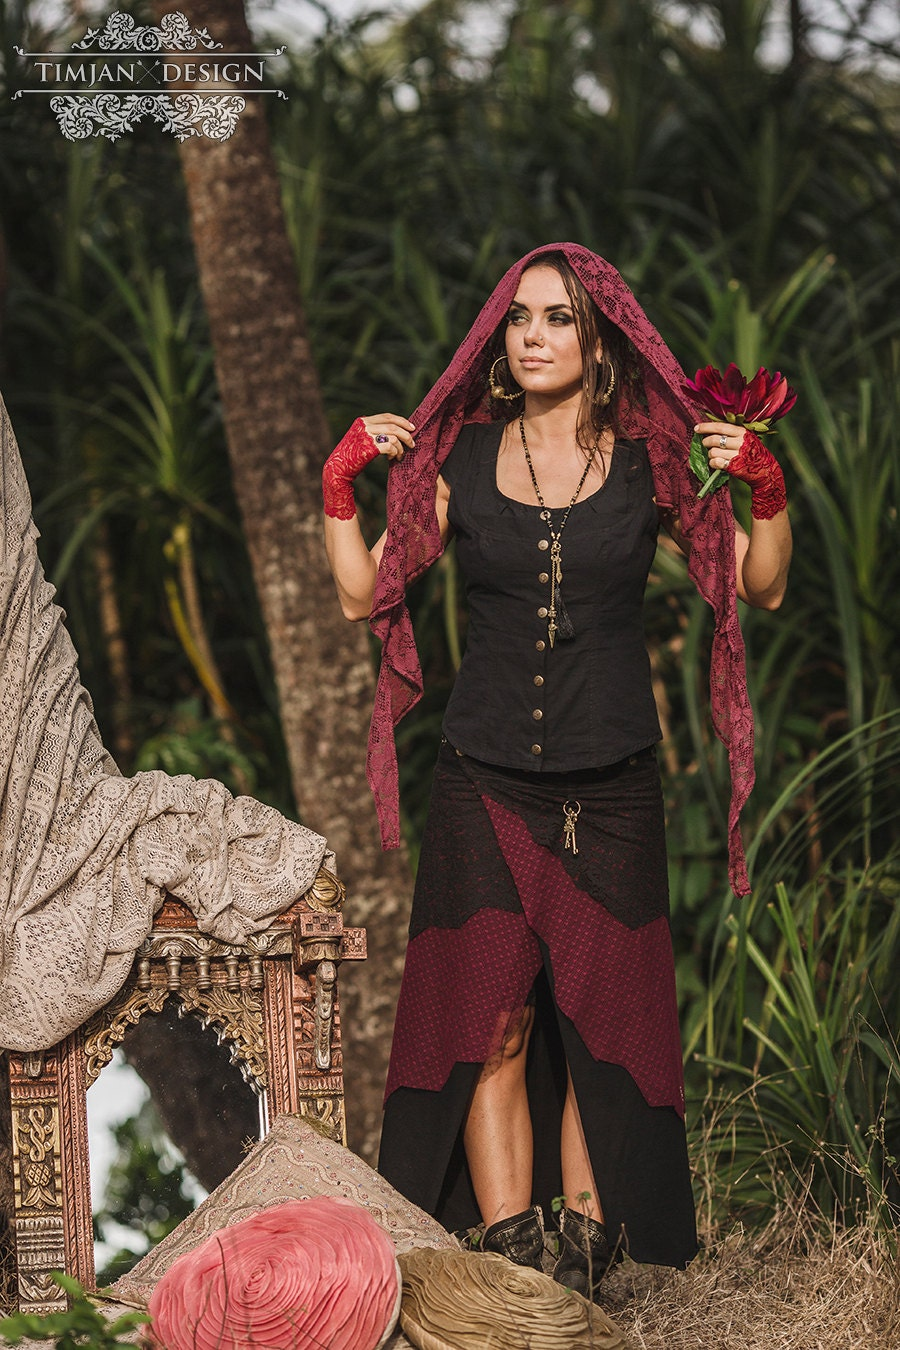 Sale LONG PIXE SKIRT Faery fairy costume Boho Hippie